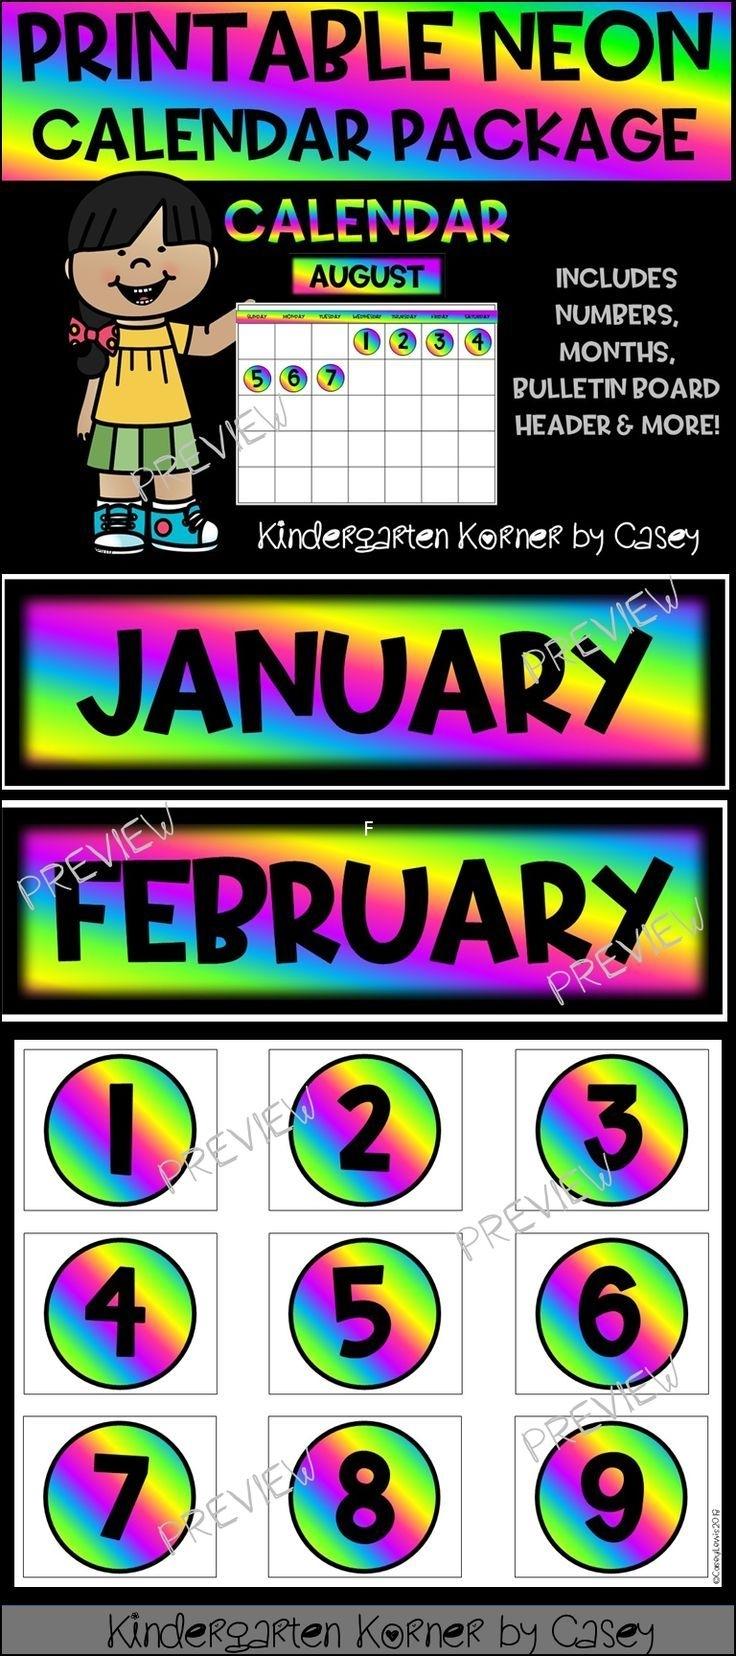 Printable Neon 12 Month Blank Calendar - Calendar